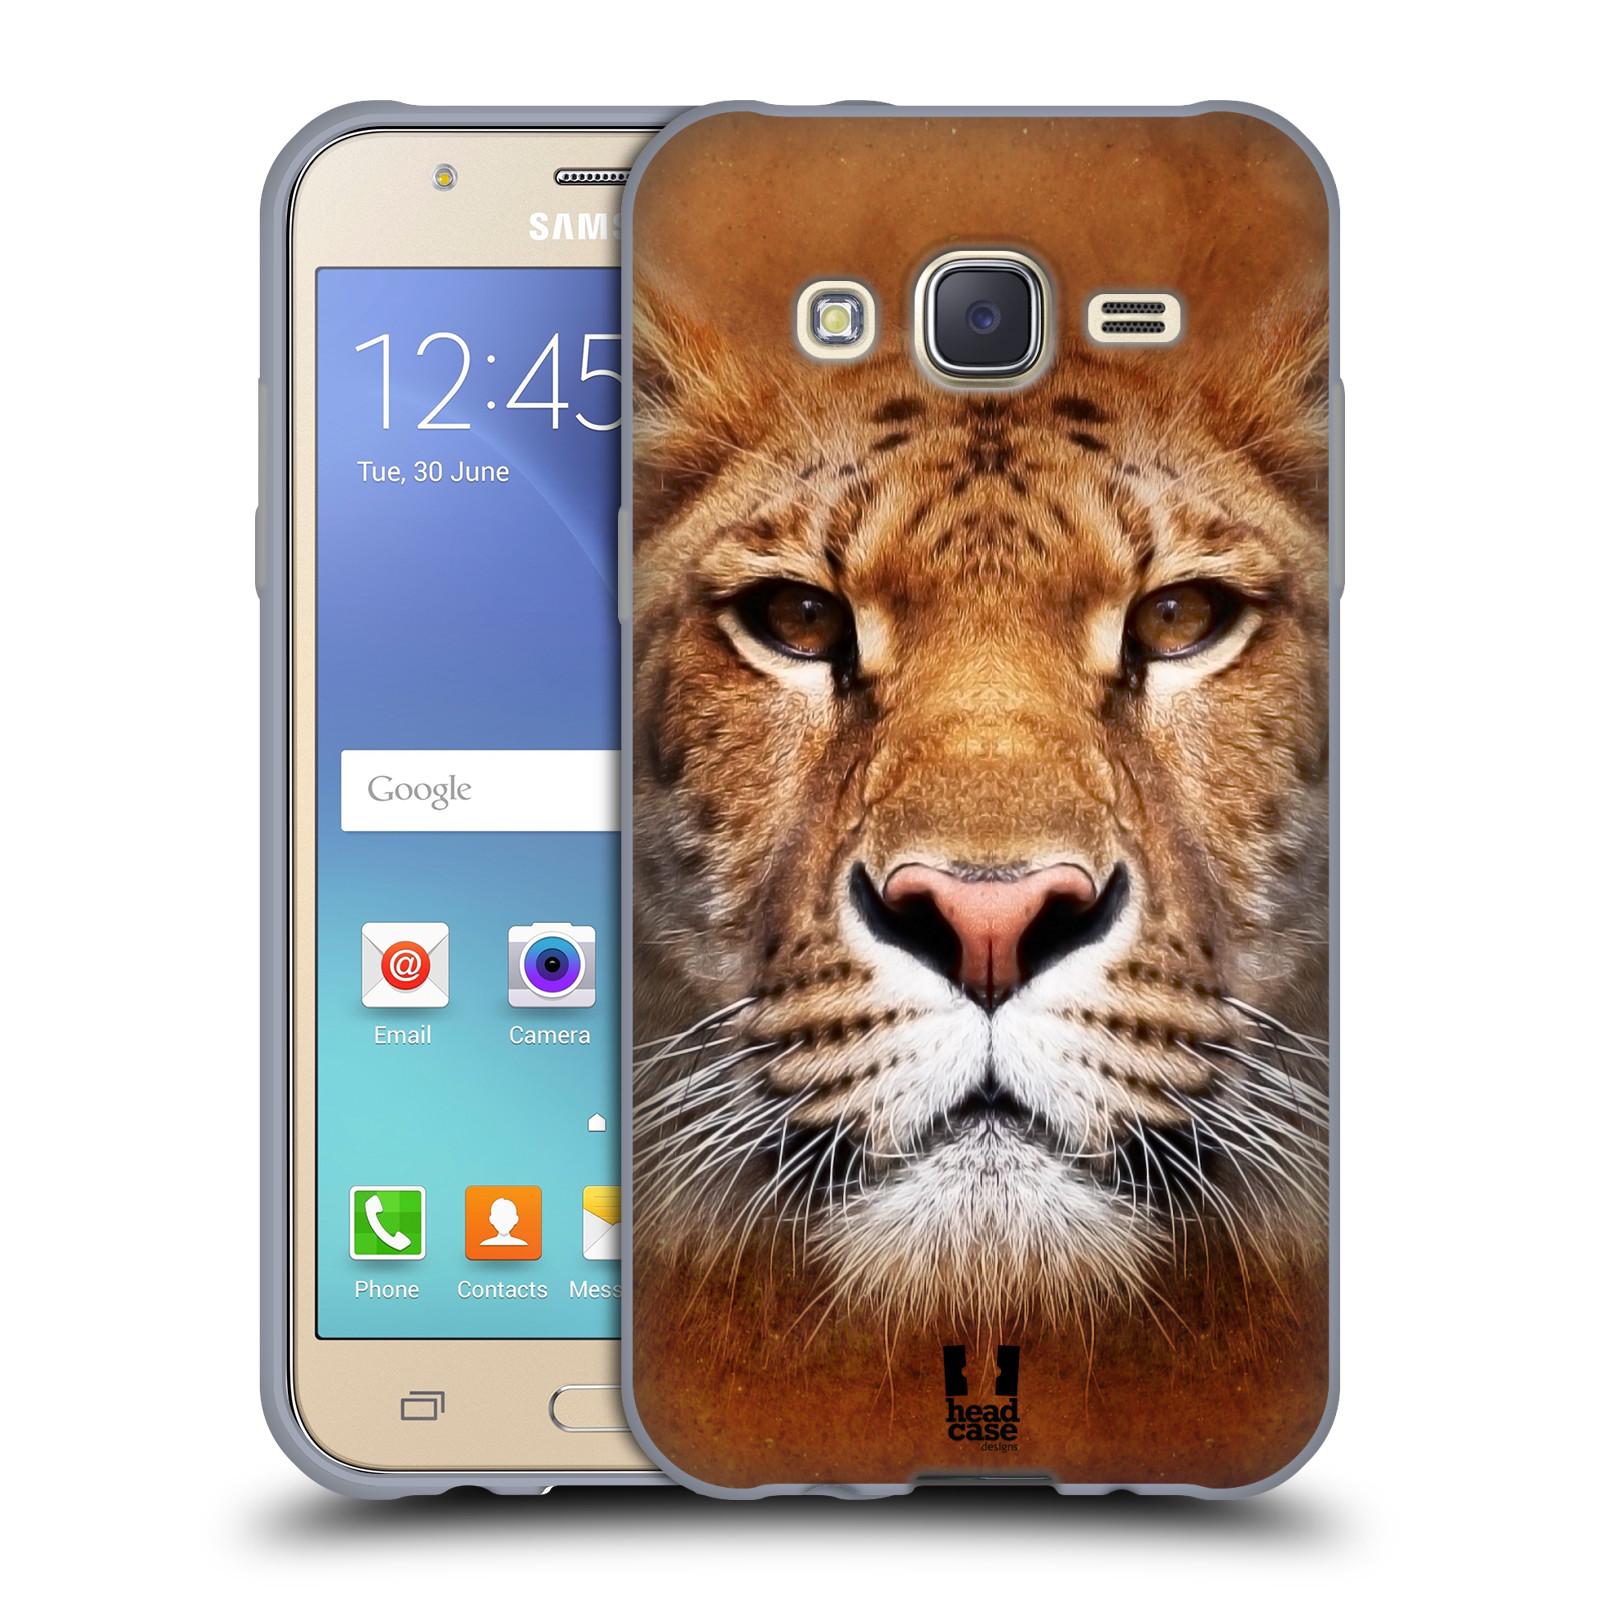 HEAD CASE silikonový obal na mobil Samsung Galaxy J5, J500, (J5 DUOS) vzor Zvířecí tváře Sibiřský tygr